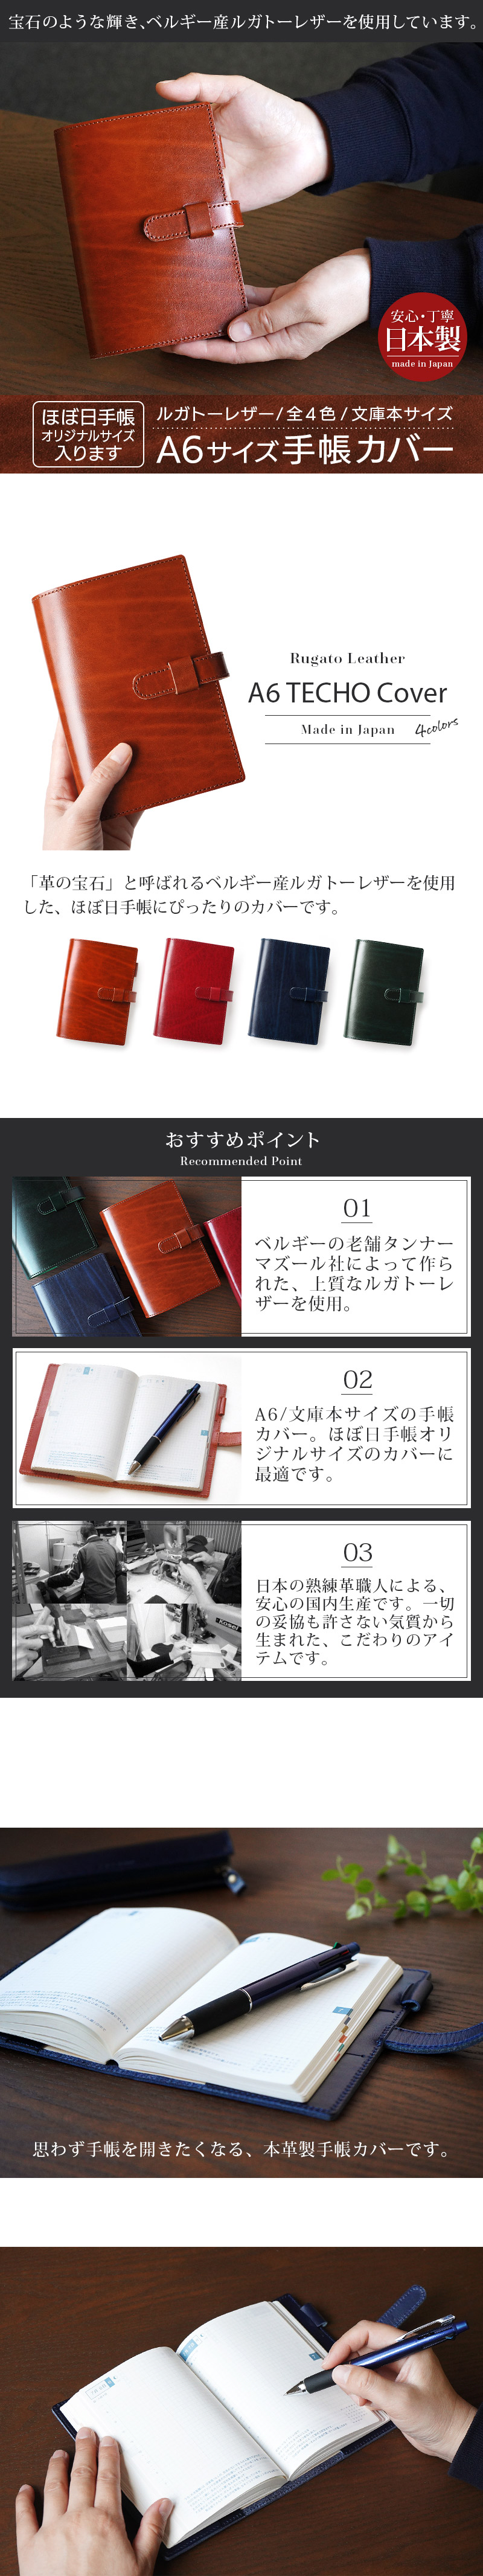 A6サイズ 手帳 文庫本 ブックカバー 。革の宝石と呼ばれる、ベルギー産の最高級 ルガトー レザー を使用